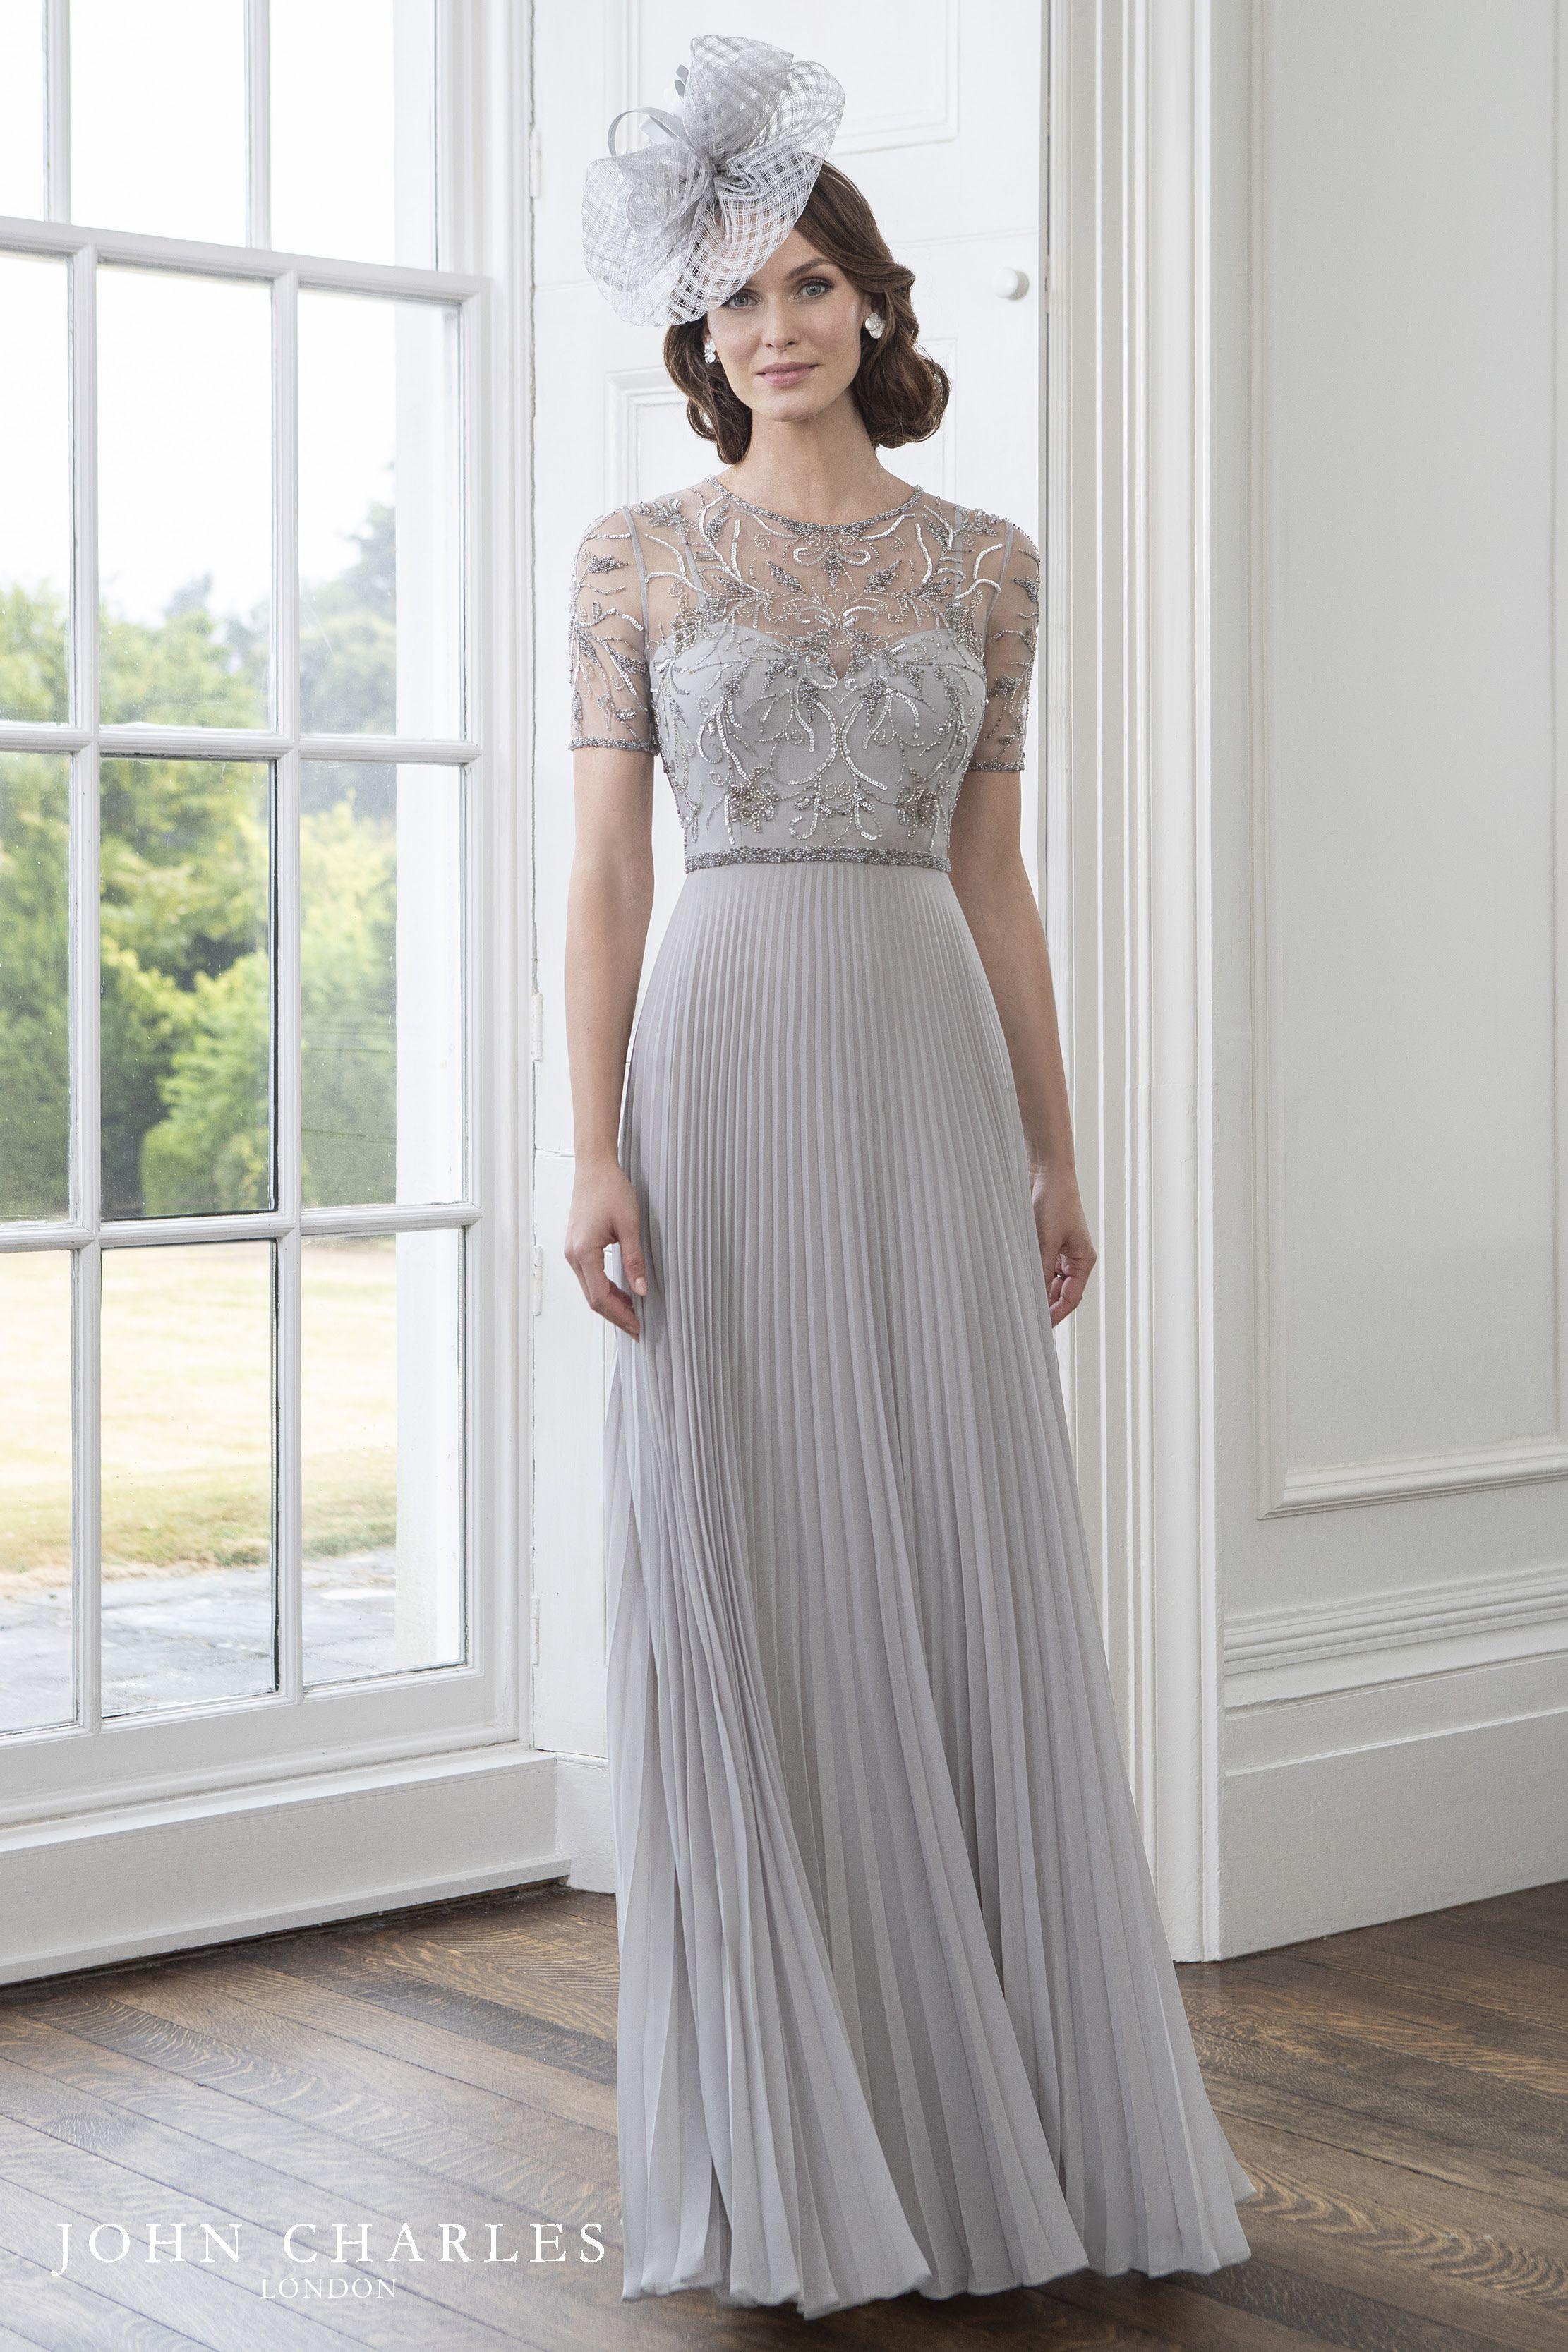 John Charles Spring Summer 2019 Collection Bride Dress Wedding Dresses Simple Mother Of The Bride Dresses